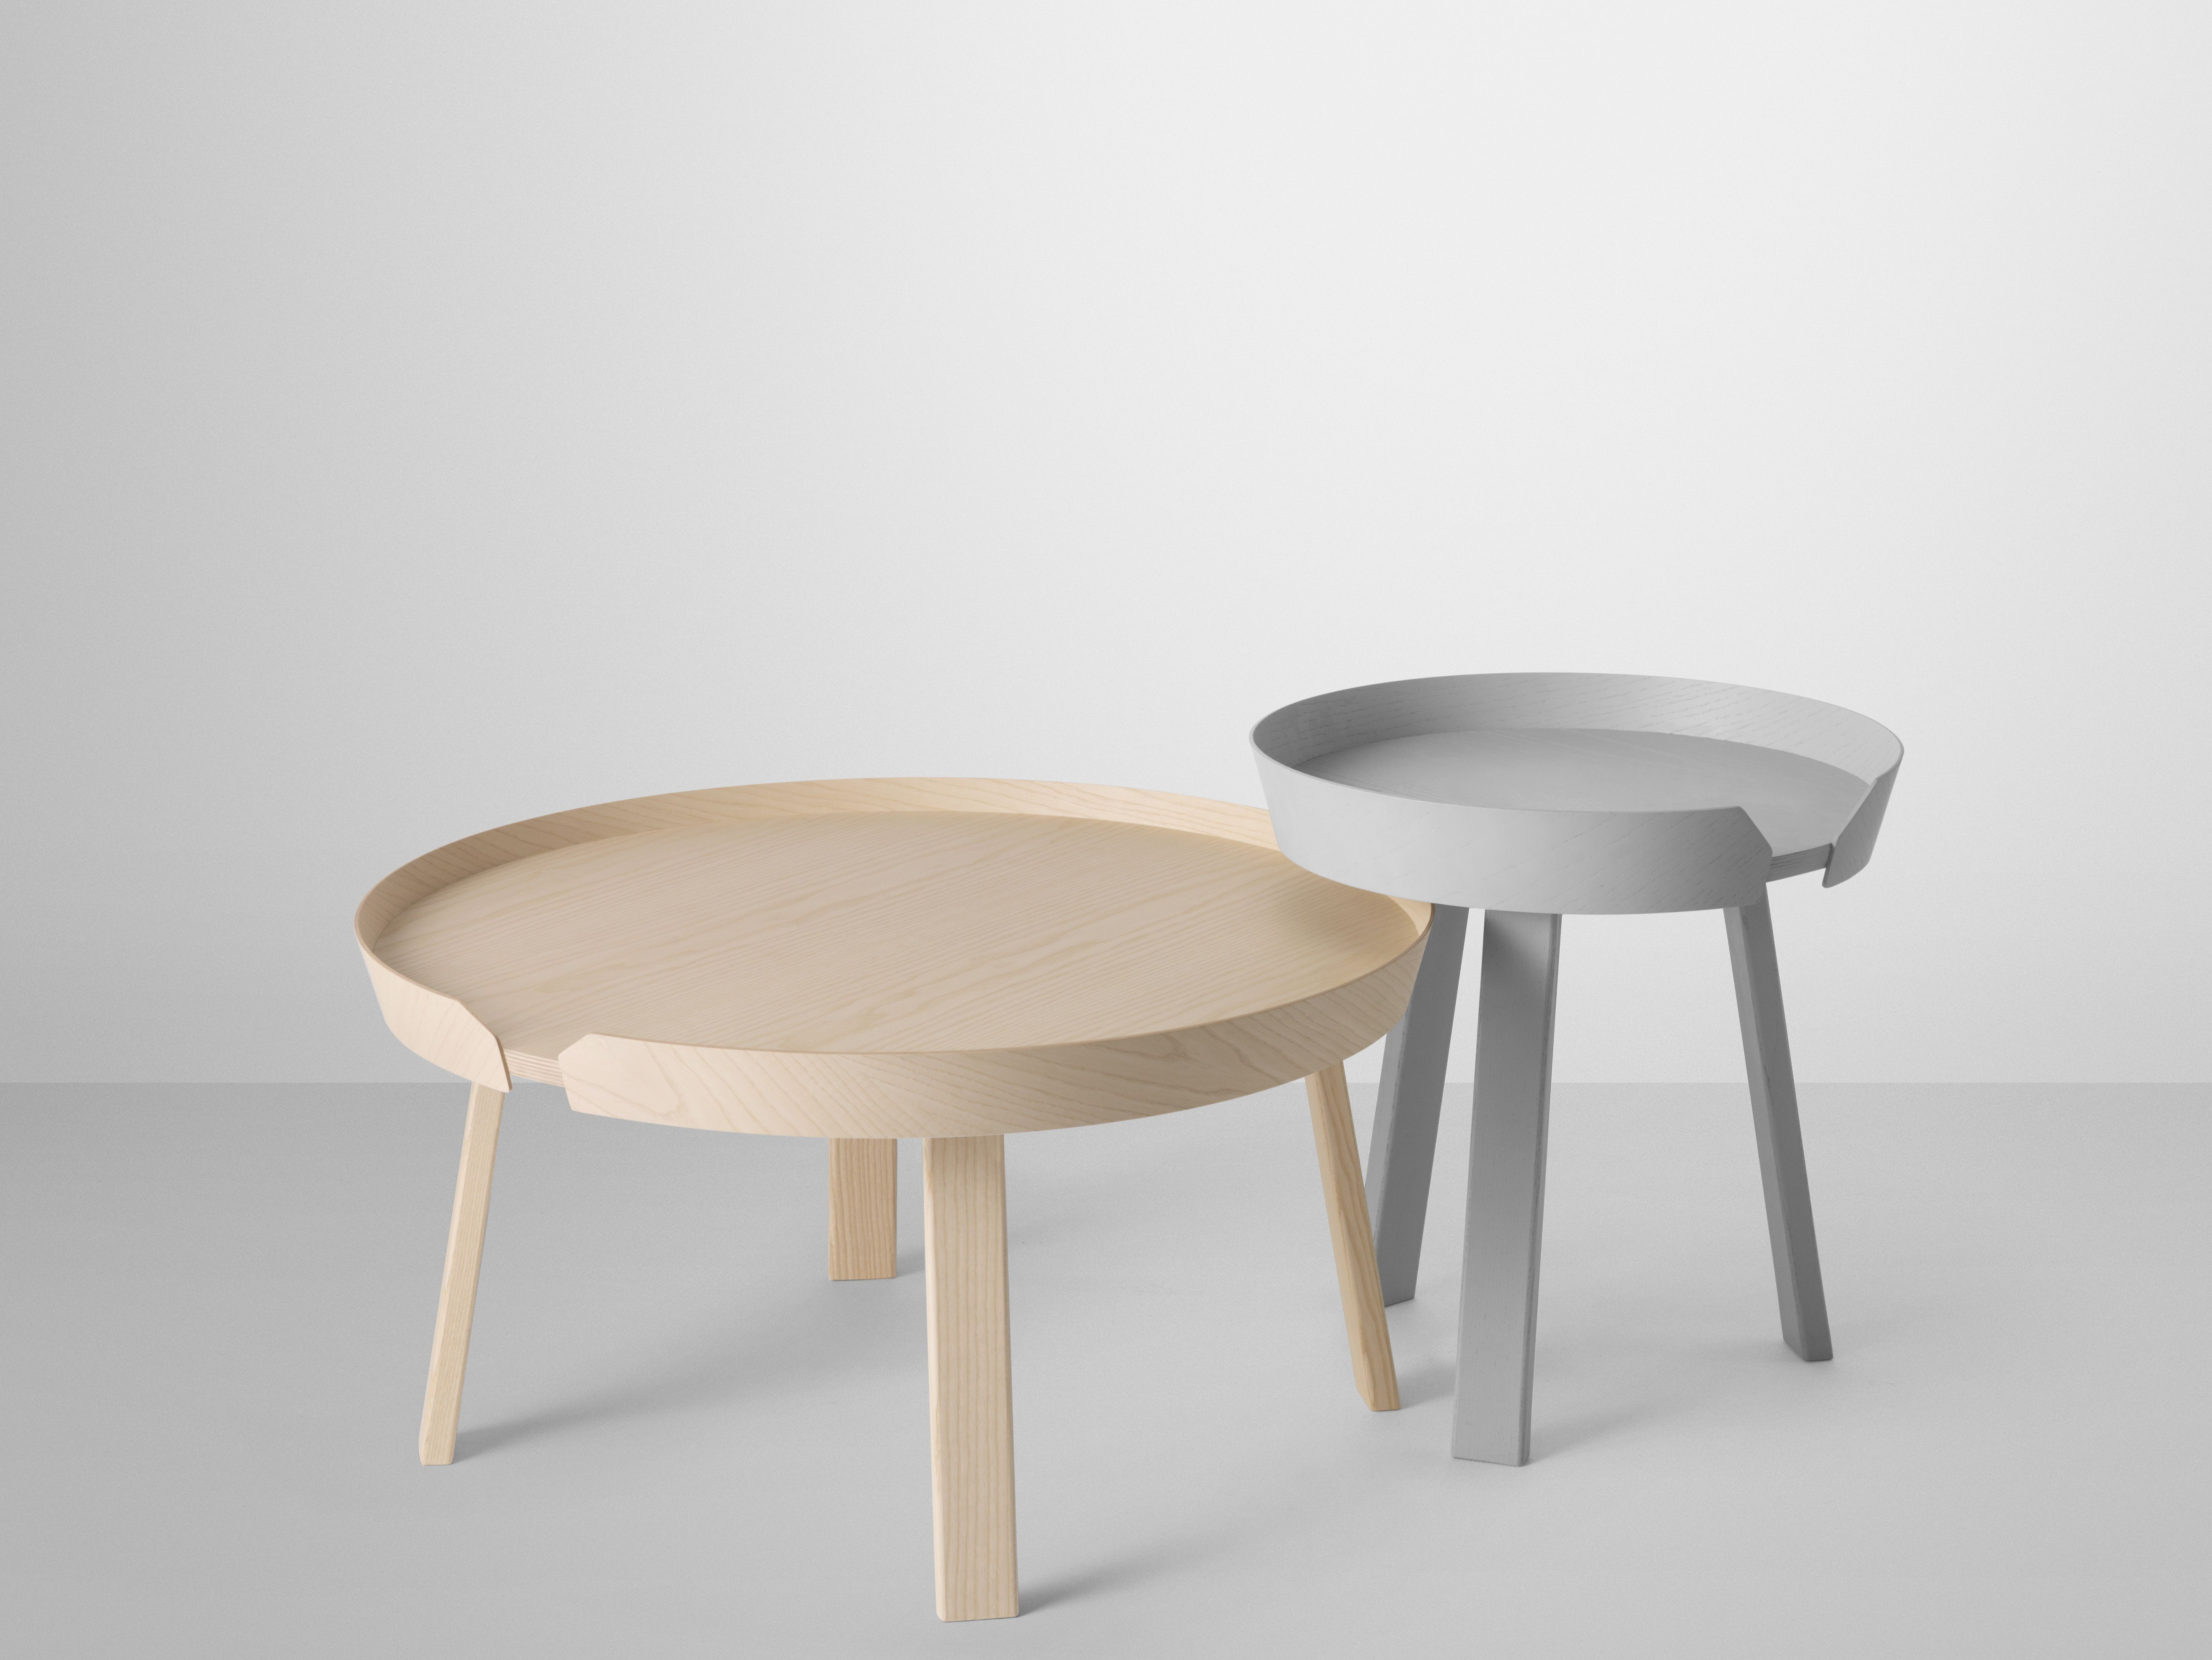 Around Design By Thomas Bentzen Coffee Table Coffe Table Nesting Coffee Tables [ 3962 x 5279 Pixel ]